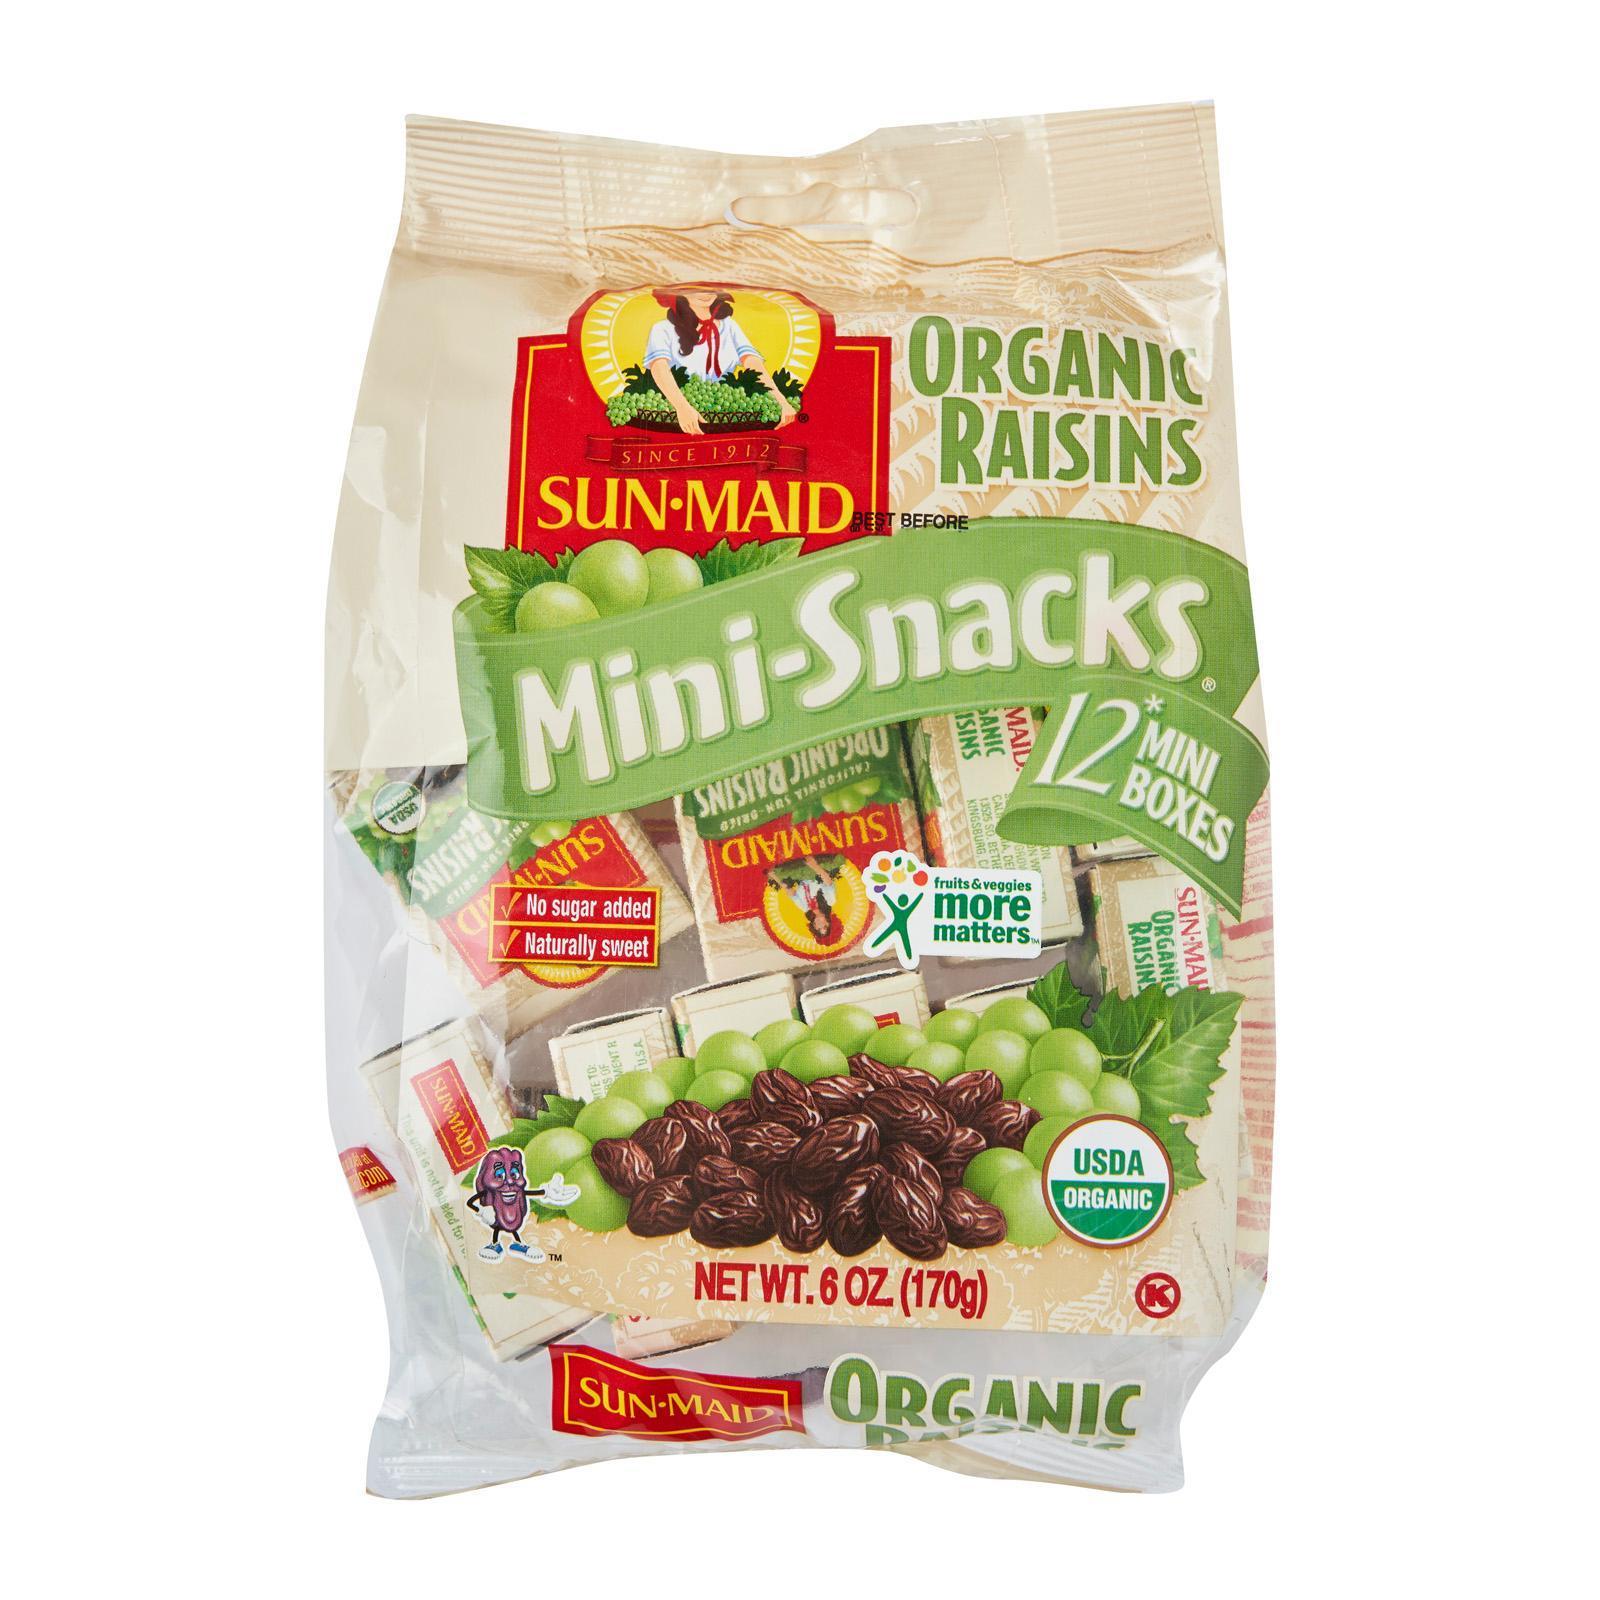 Sun-Maid Organic Raisins - Mini-Snacks